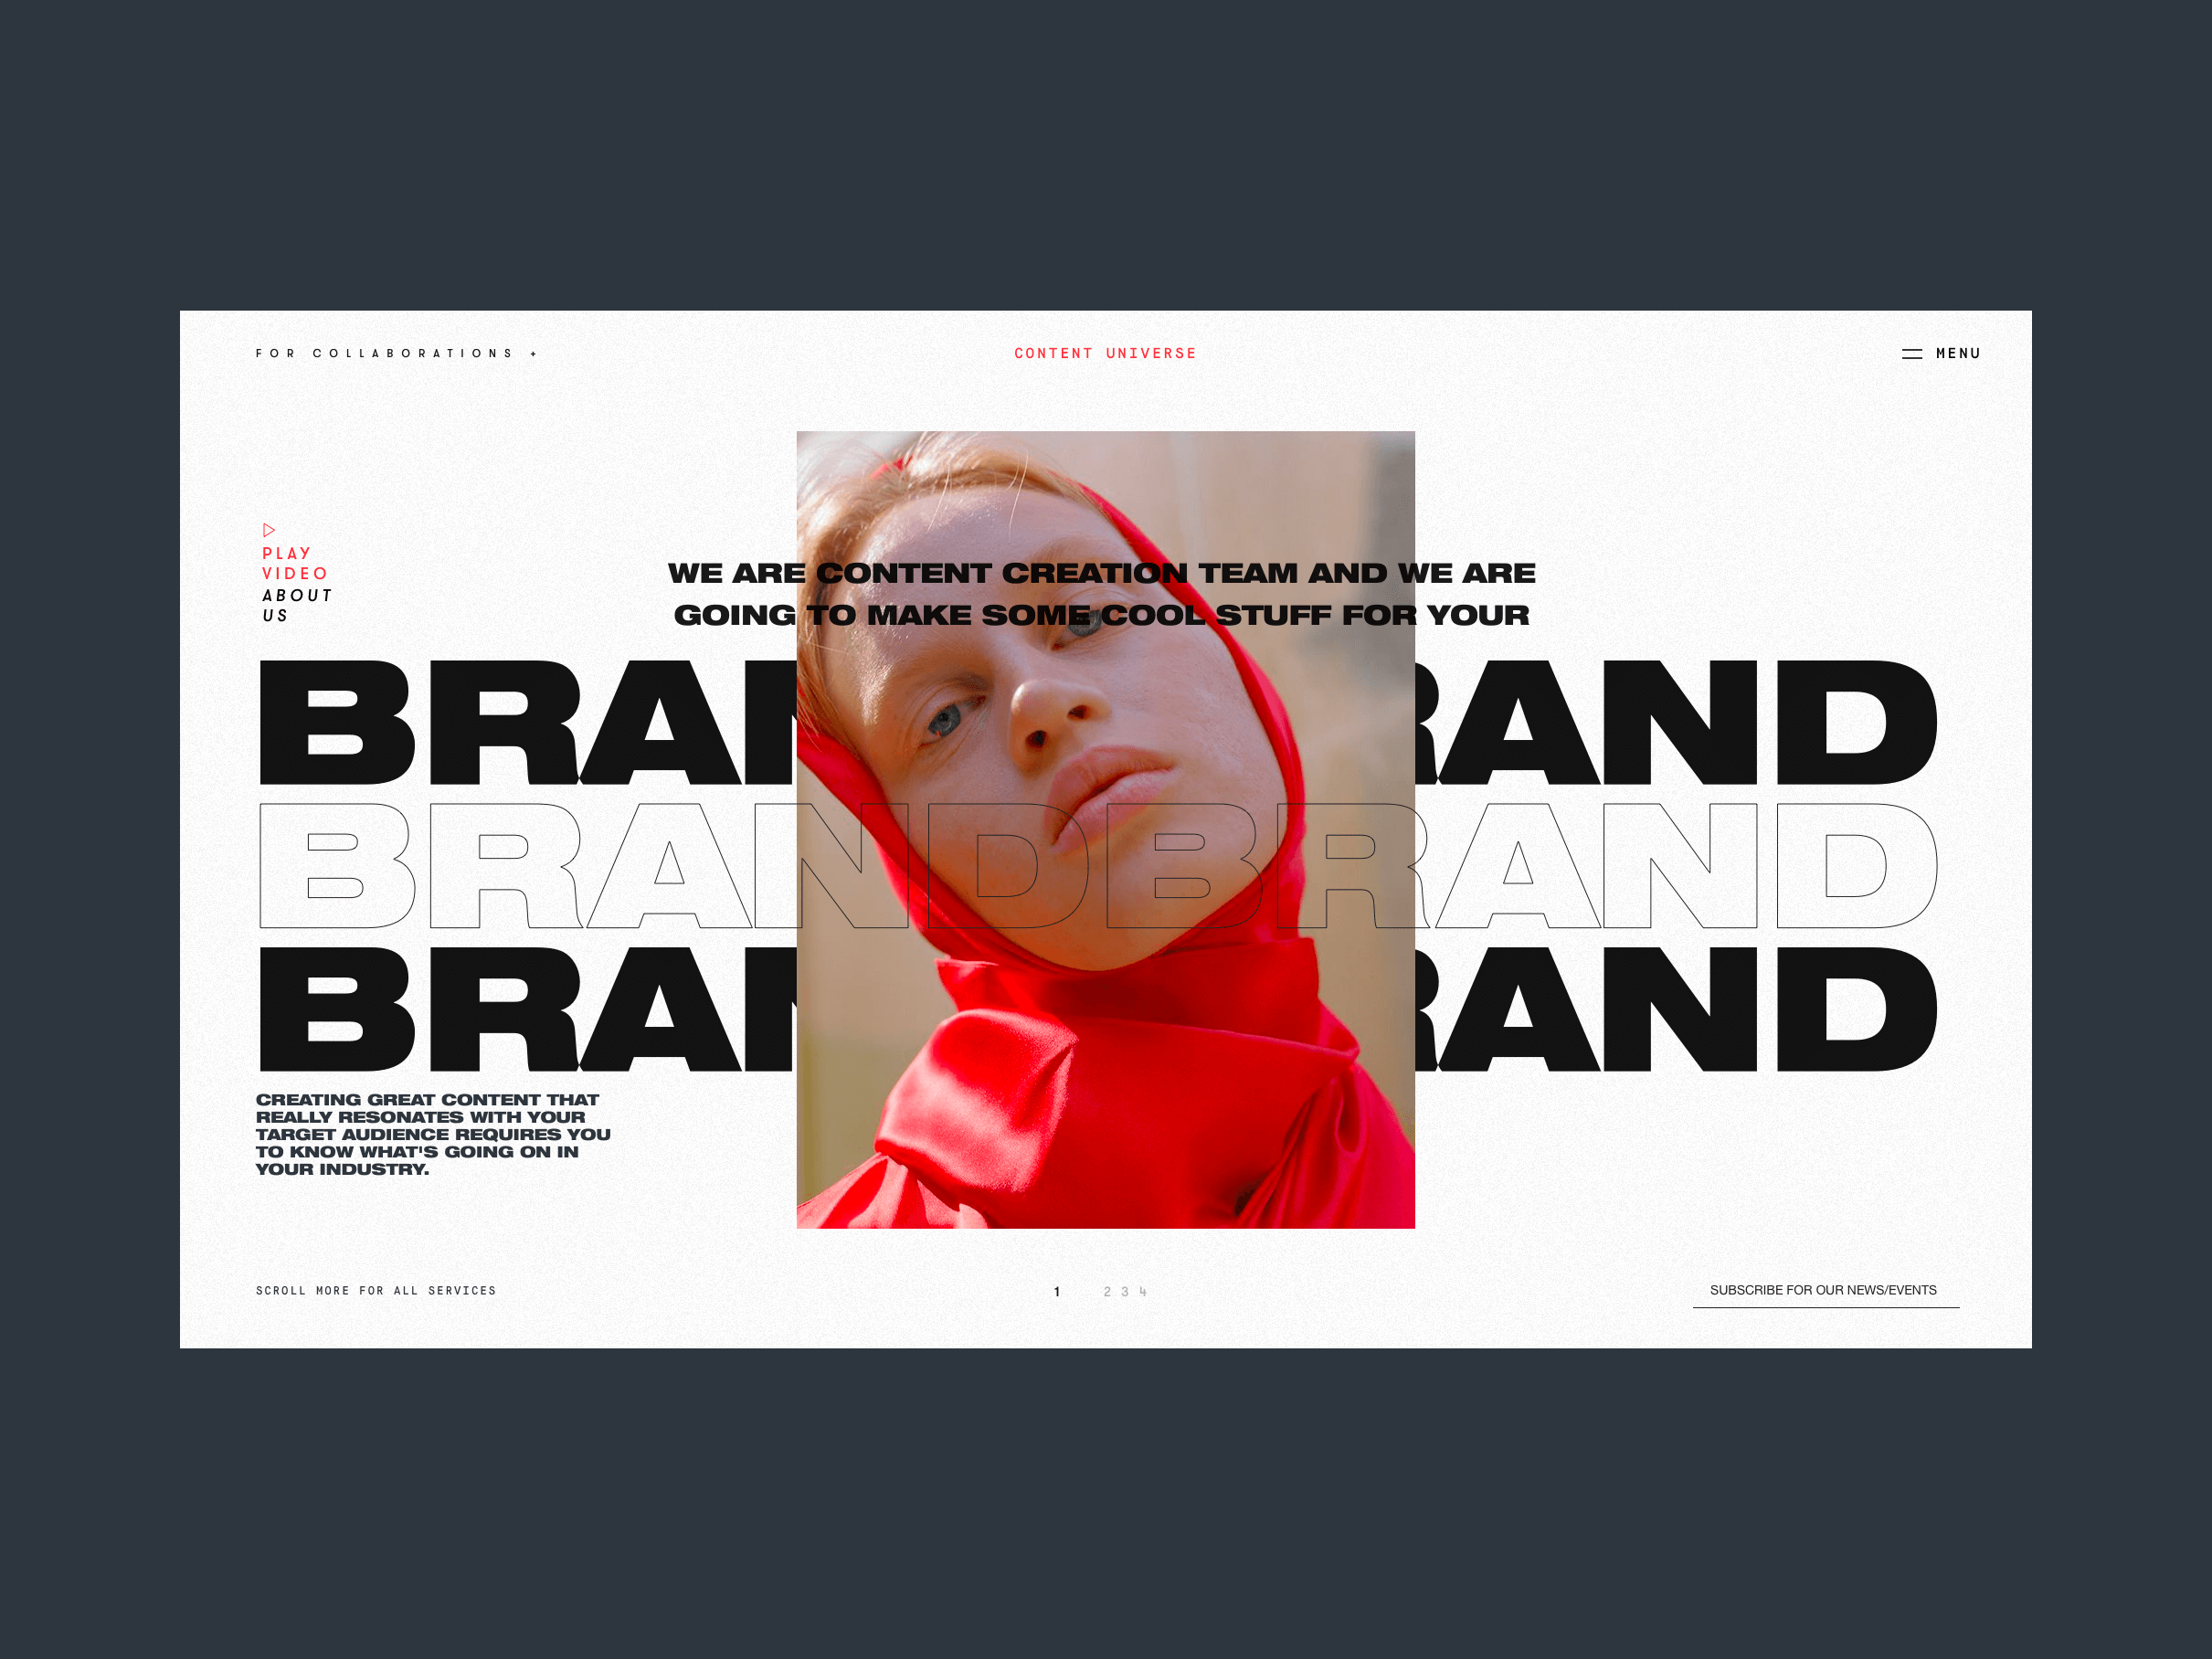 Content Universe promo page